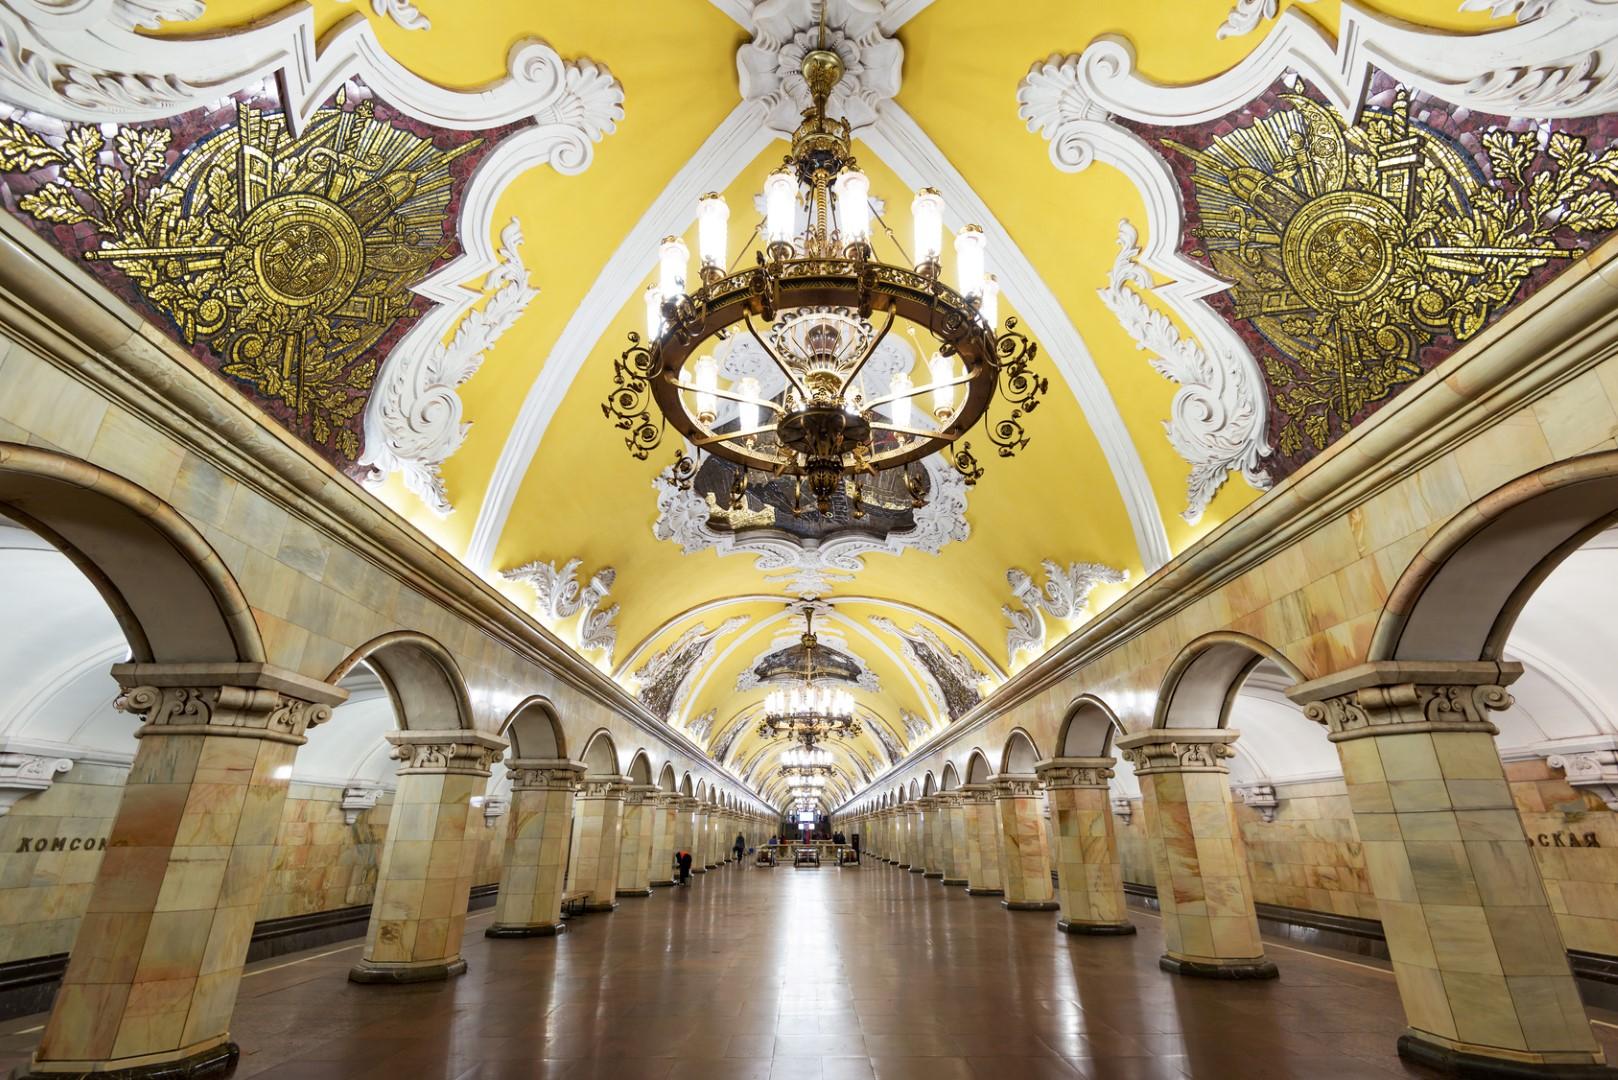 The metro station Komsomolskaya in Moscow, Russia